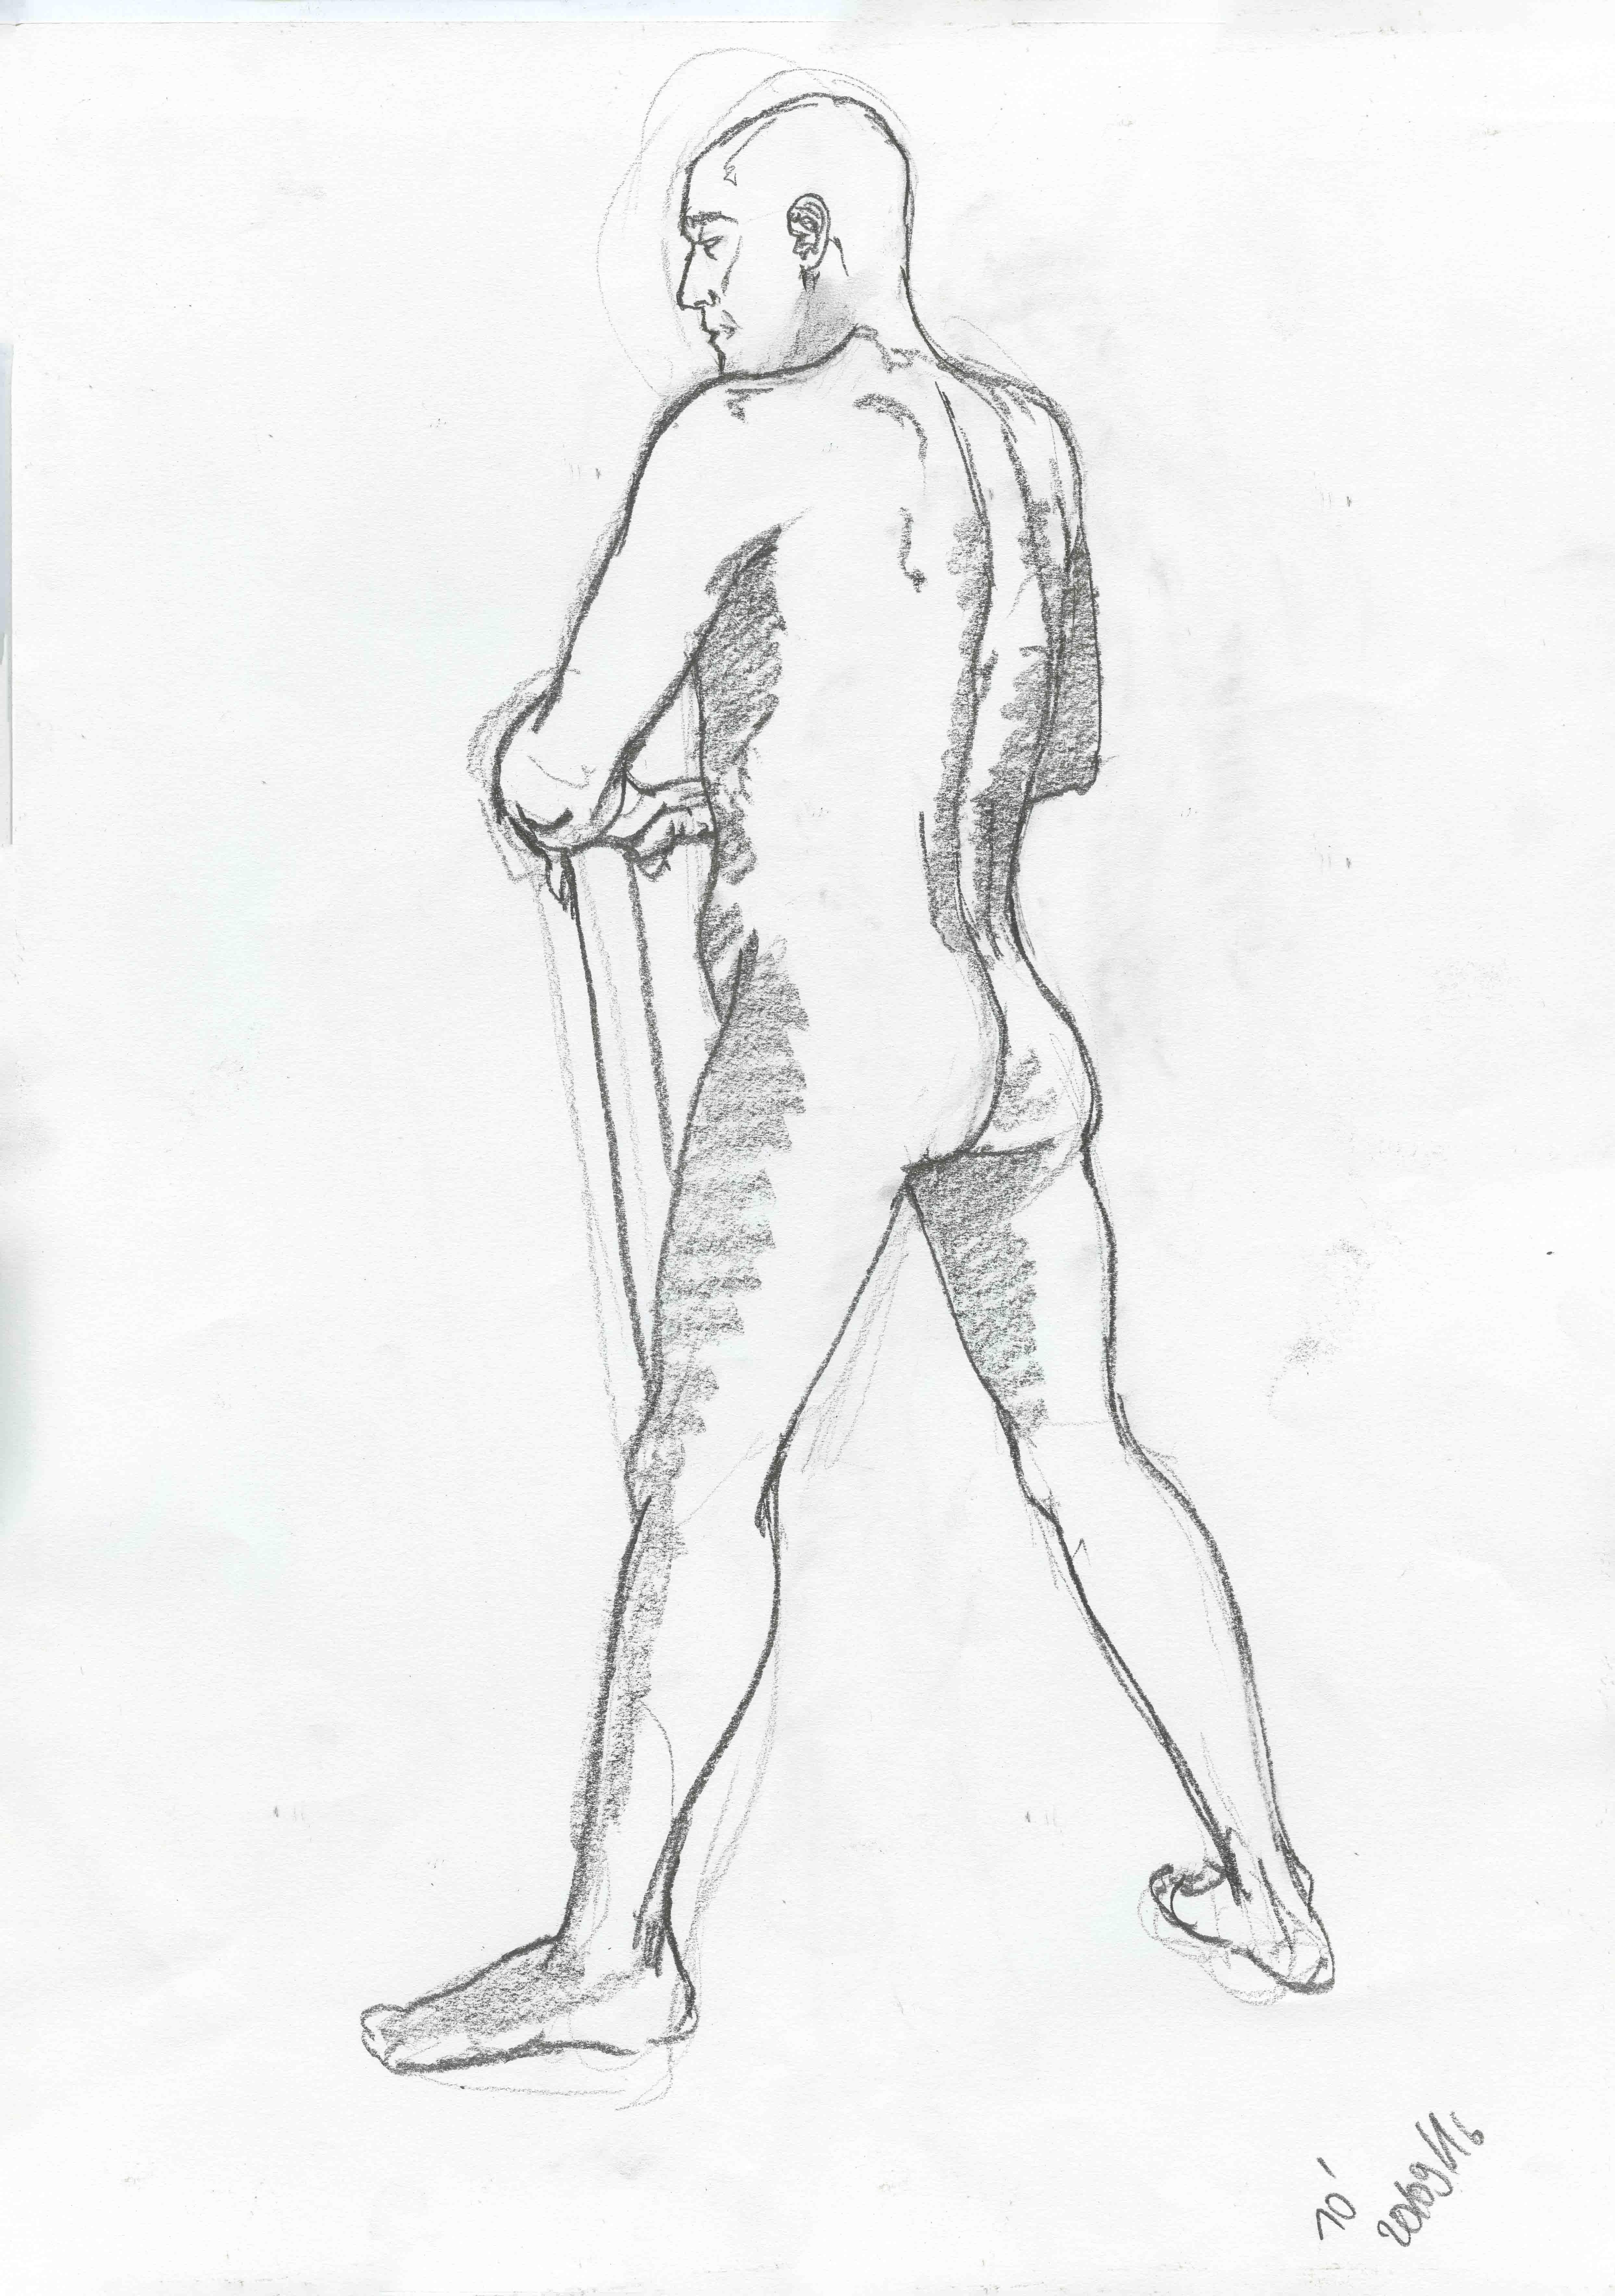 Noomis - Etudes, croquis & Wip [ Nudité ] - Page 6 160920112744655399